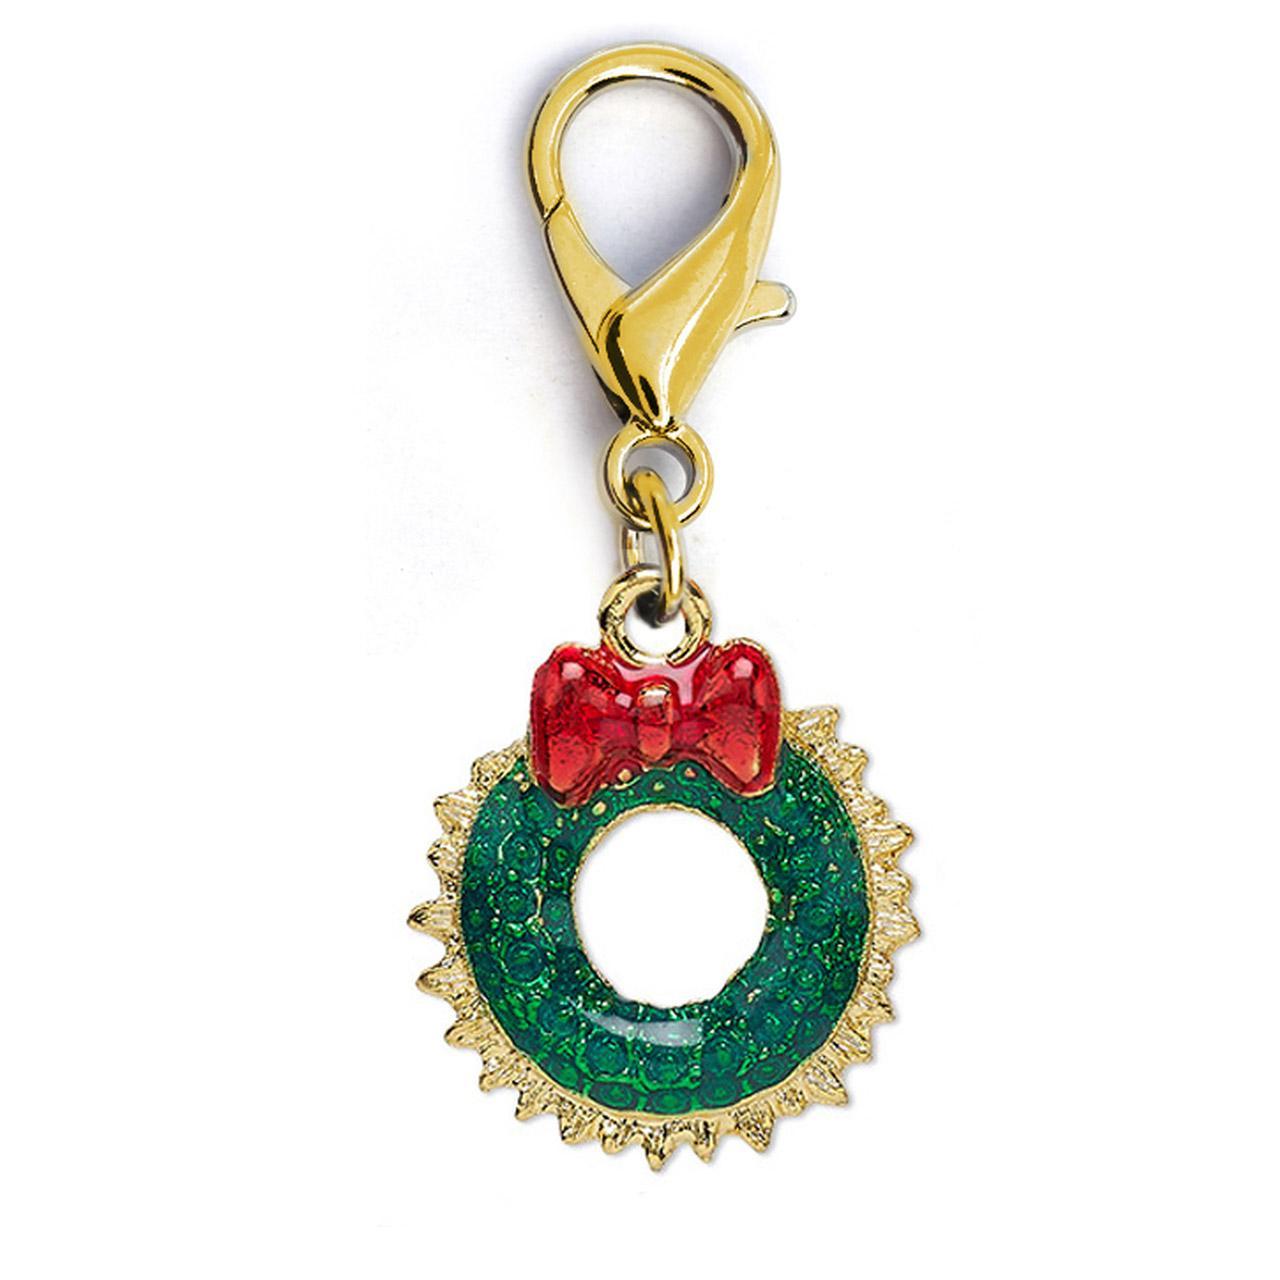 Christmas Wreath Dog Collar Charm by Diva Dog - Gold